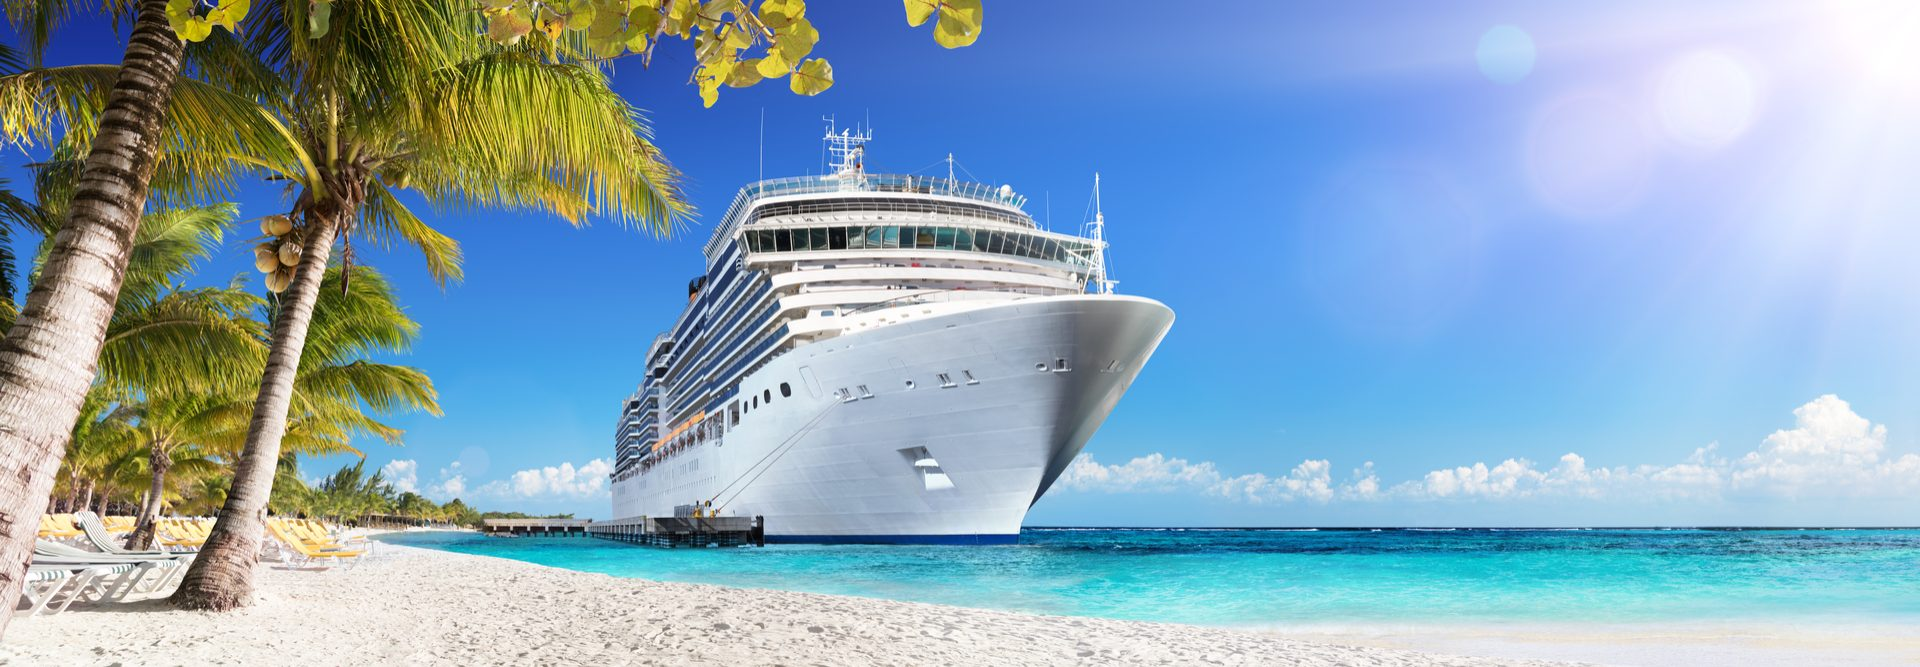 Kariibi mere kruiisid Royal Caribbeani laevade pardal